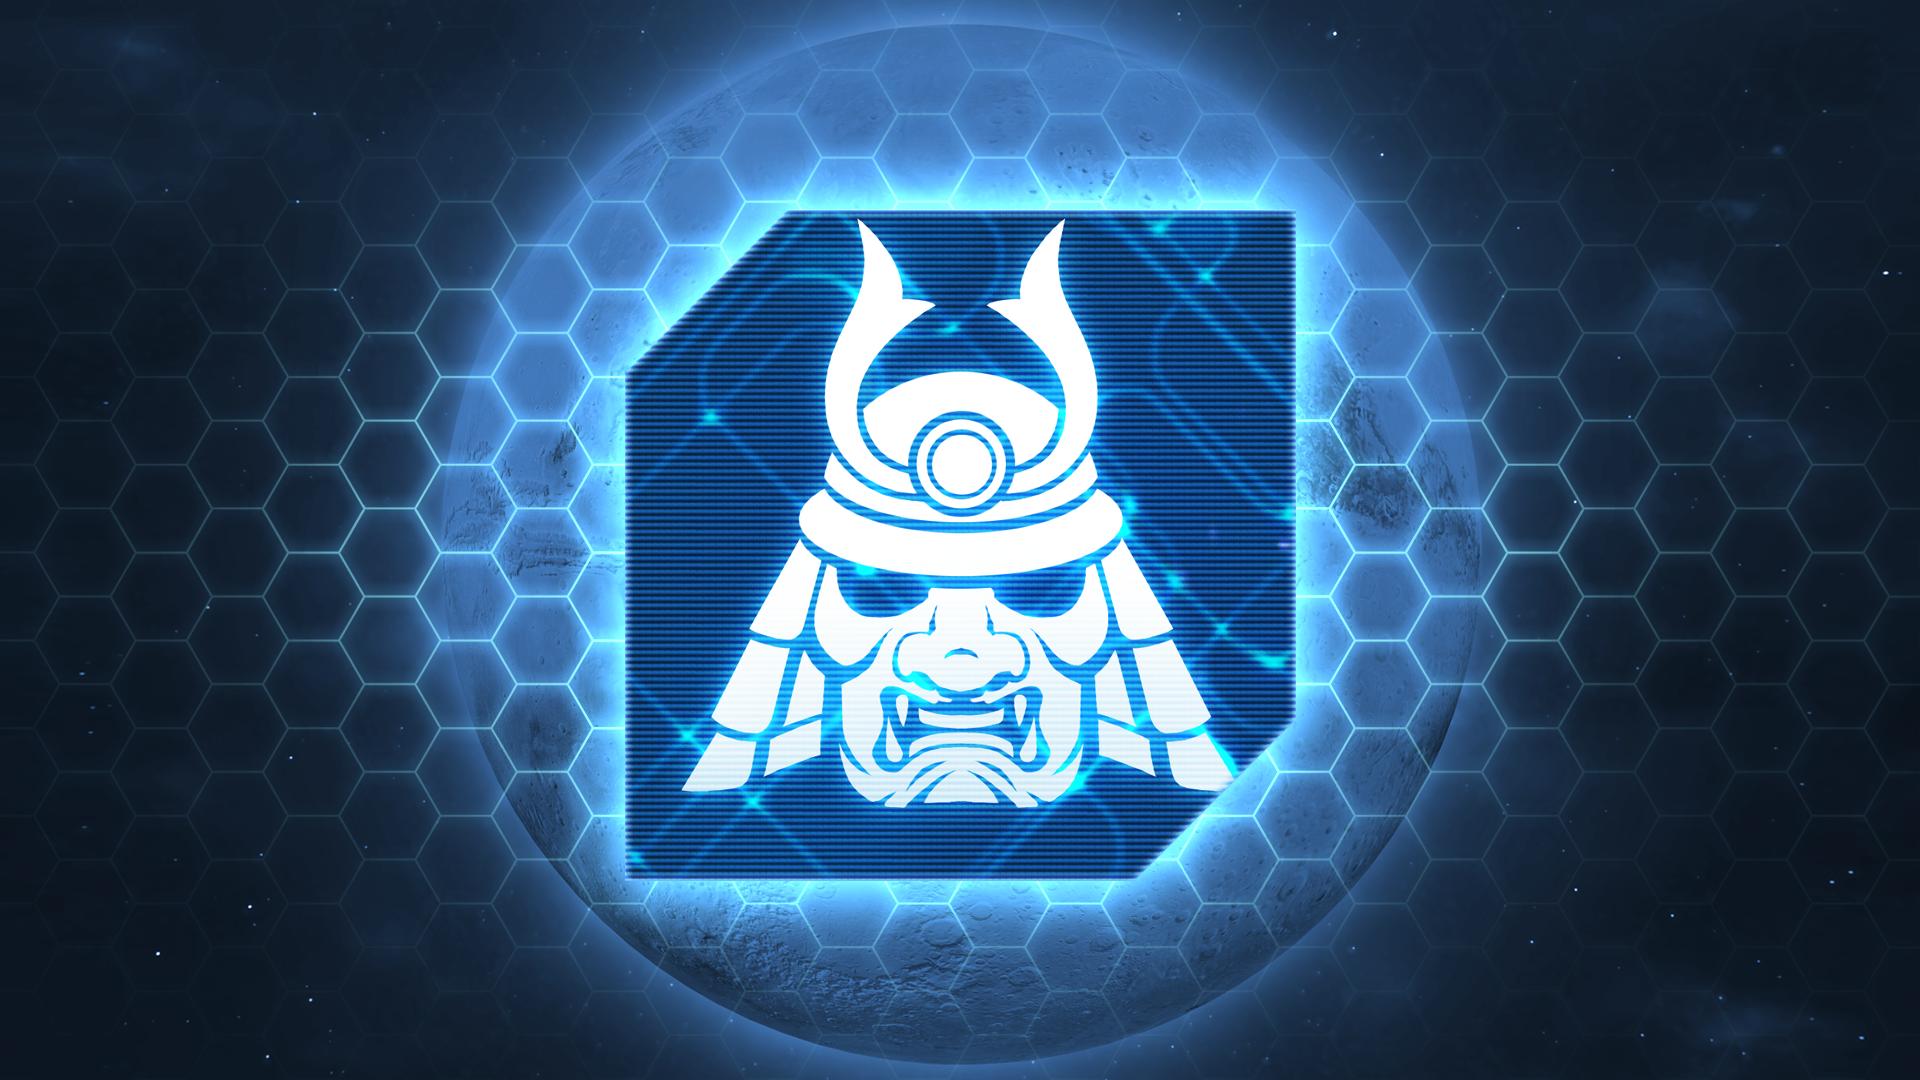 Icon for Bushido